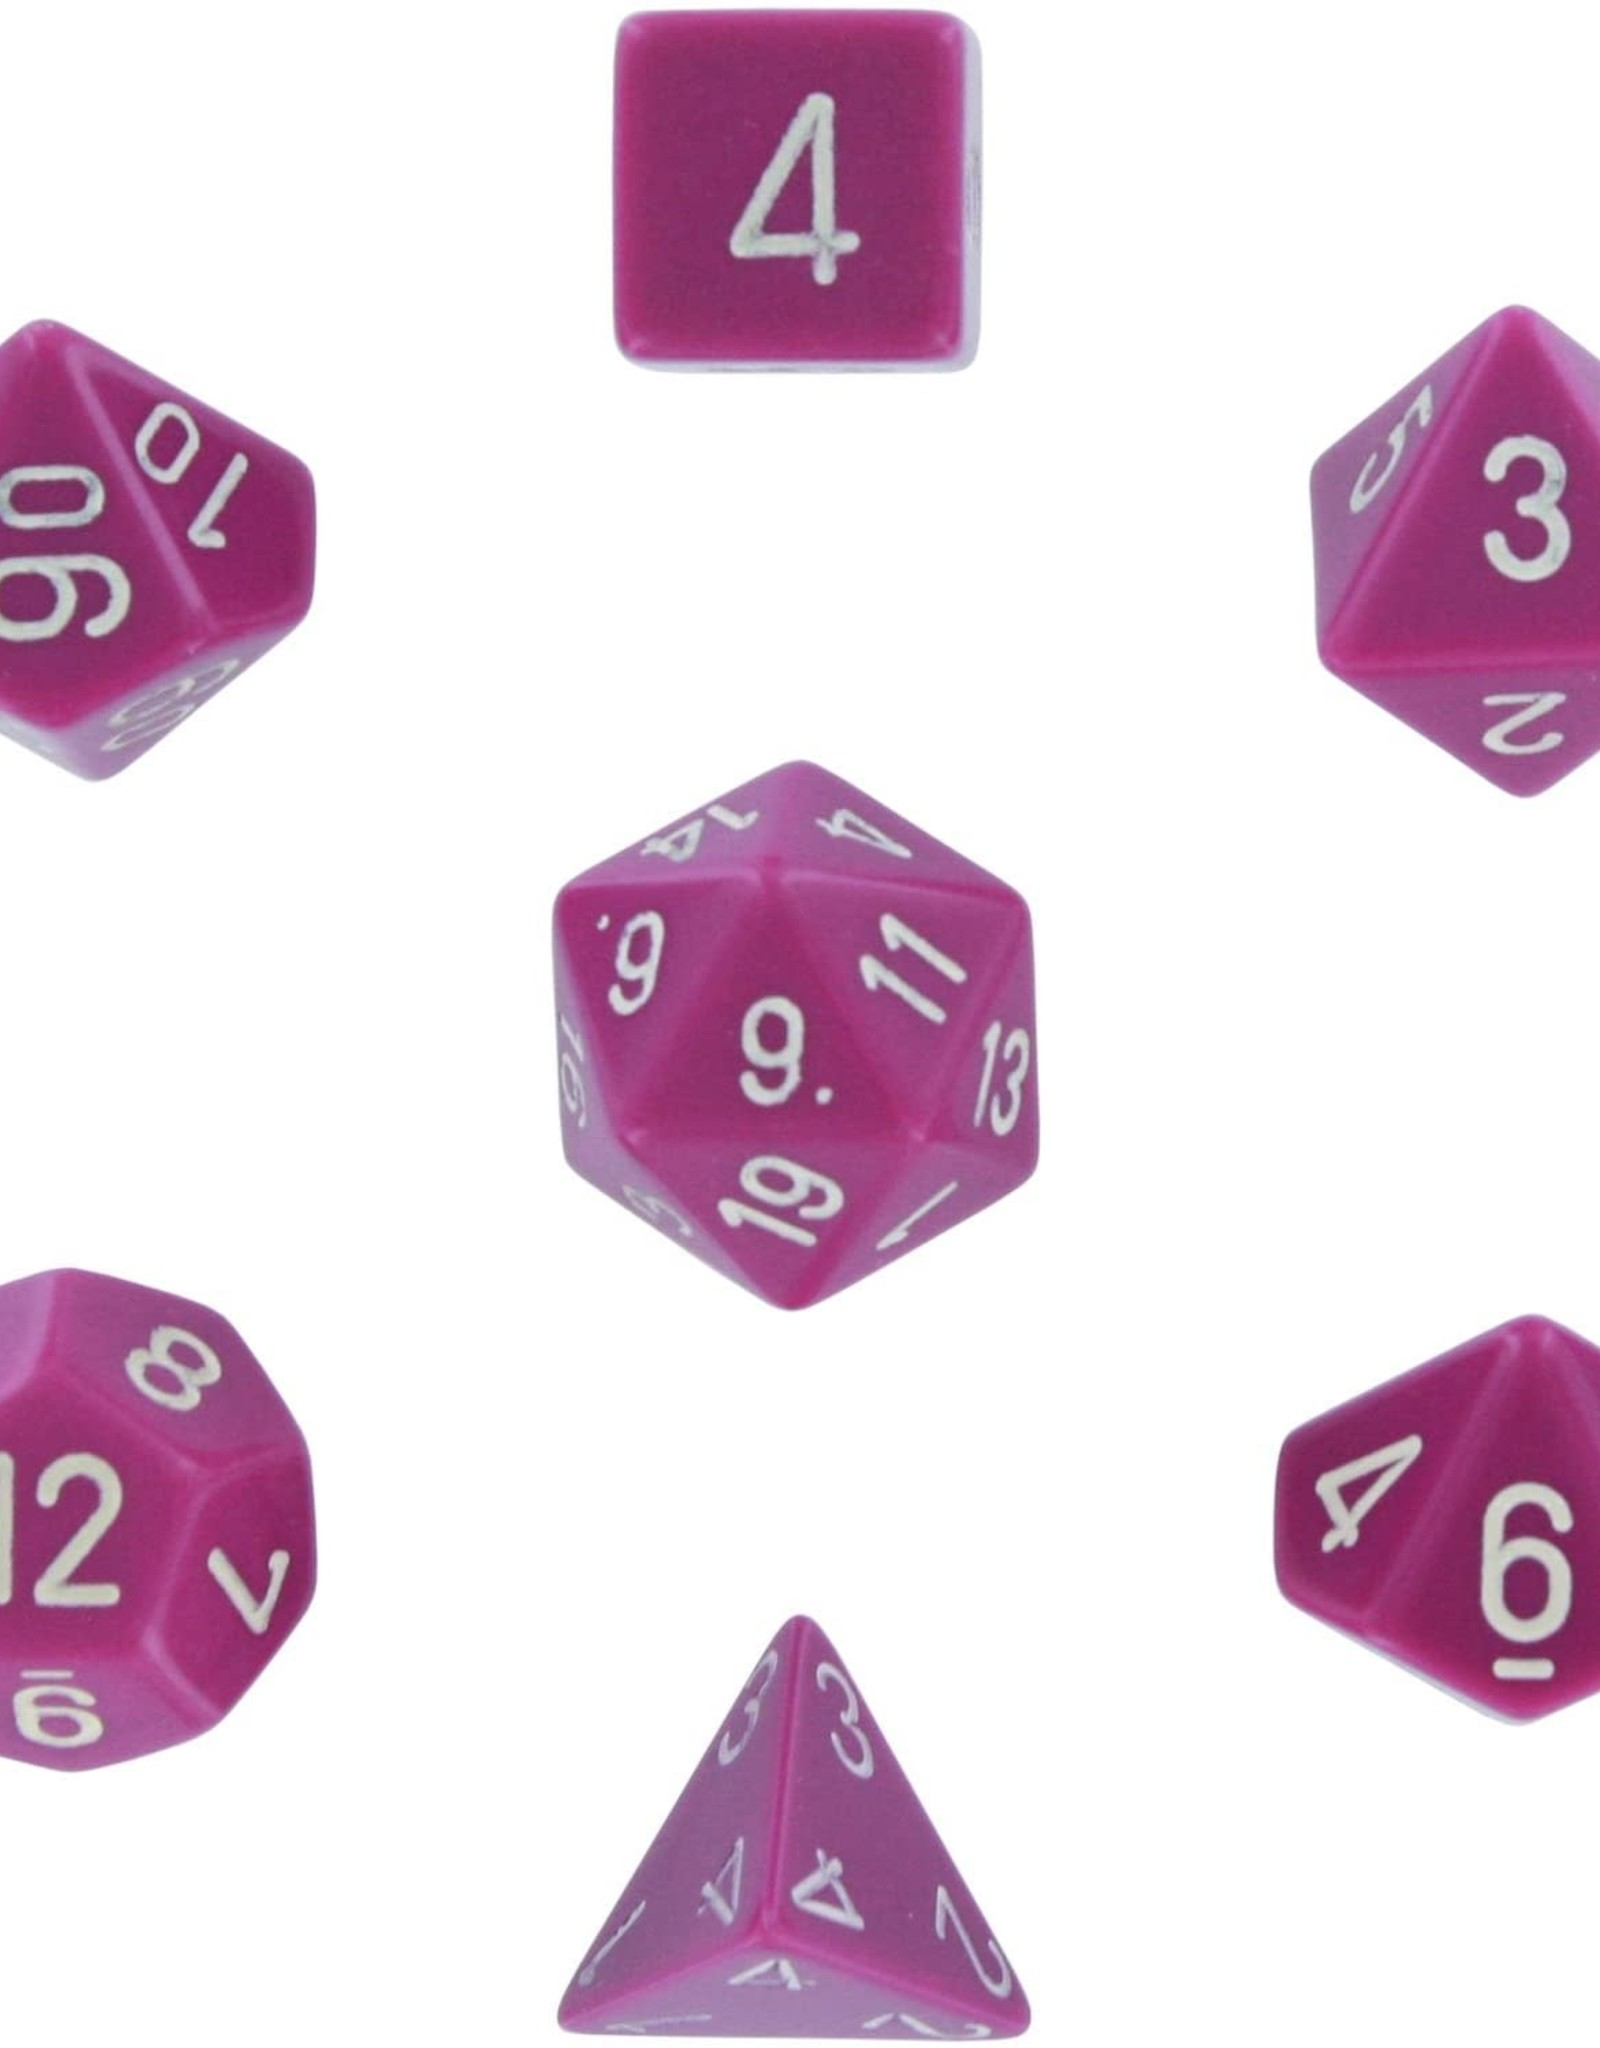 Chessex Chessex CHX25427 Dice-Opaque Light Purple/White Set, Multicolor